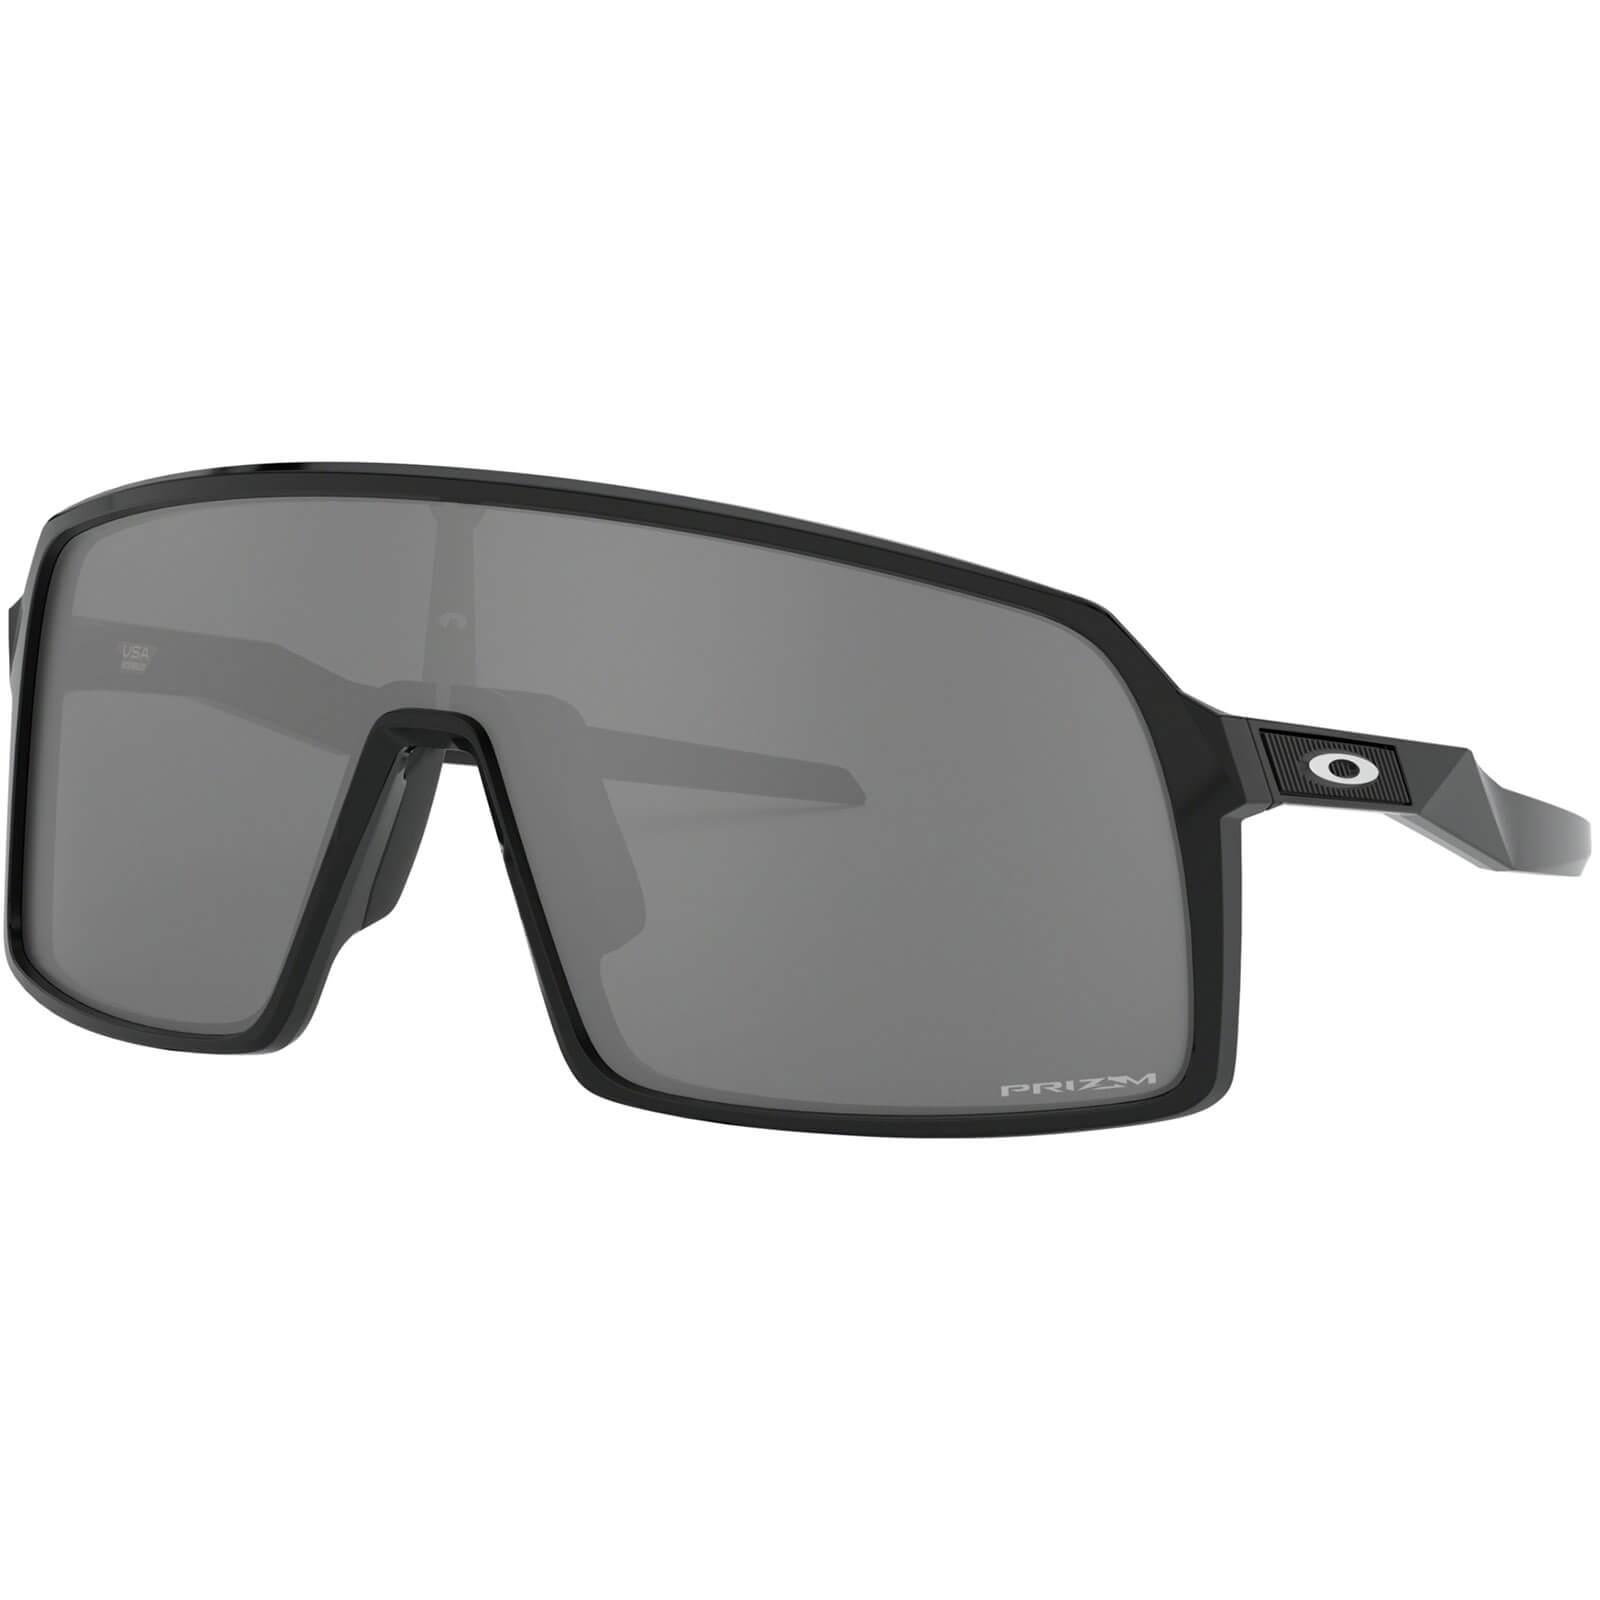 Oakley Sutro Sunglasses - Polished Black/Prizm Black